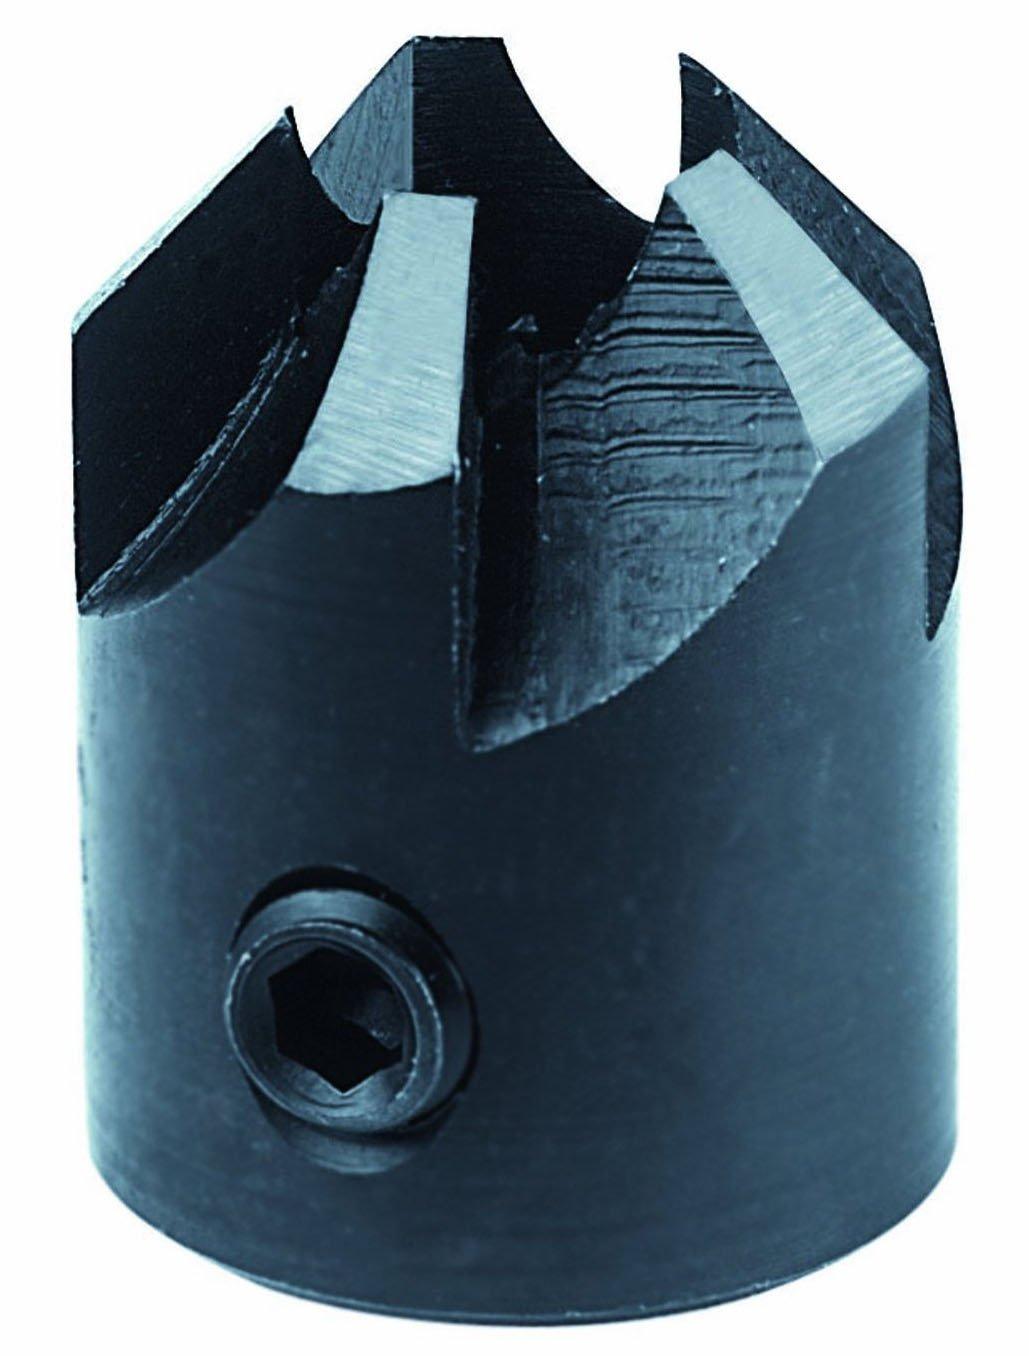 Fisch  FSH-048206 10-16mm HSS Countersink Affinity Tools 6391000